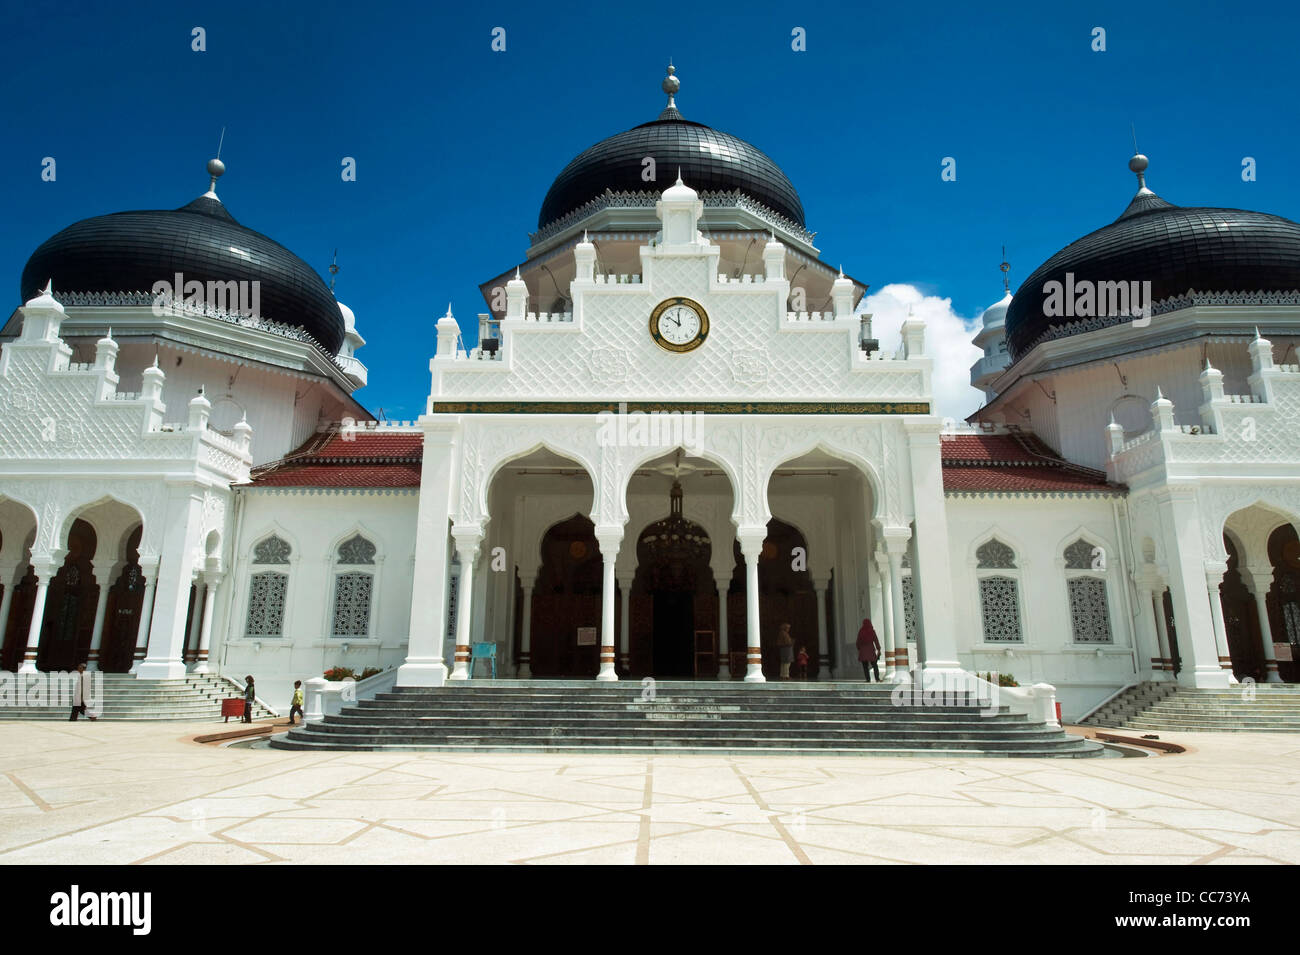 Indonesia Sumatra Banda Aceh Gran Mezquita Baiturrahman Mesjid